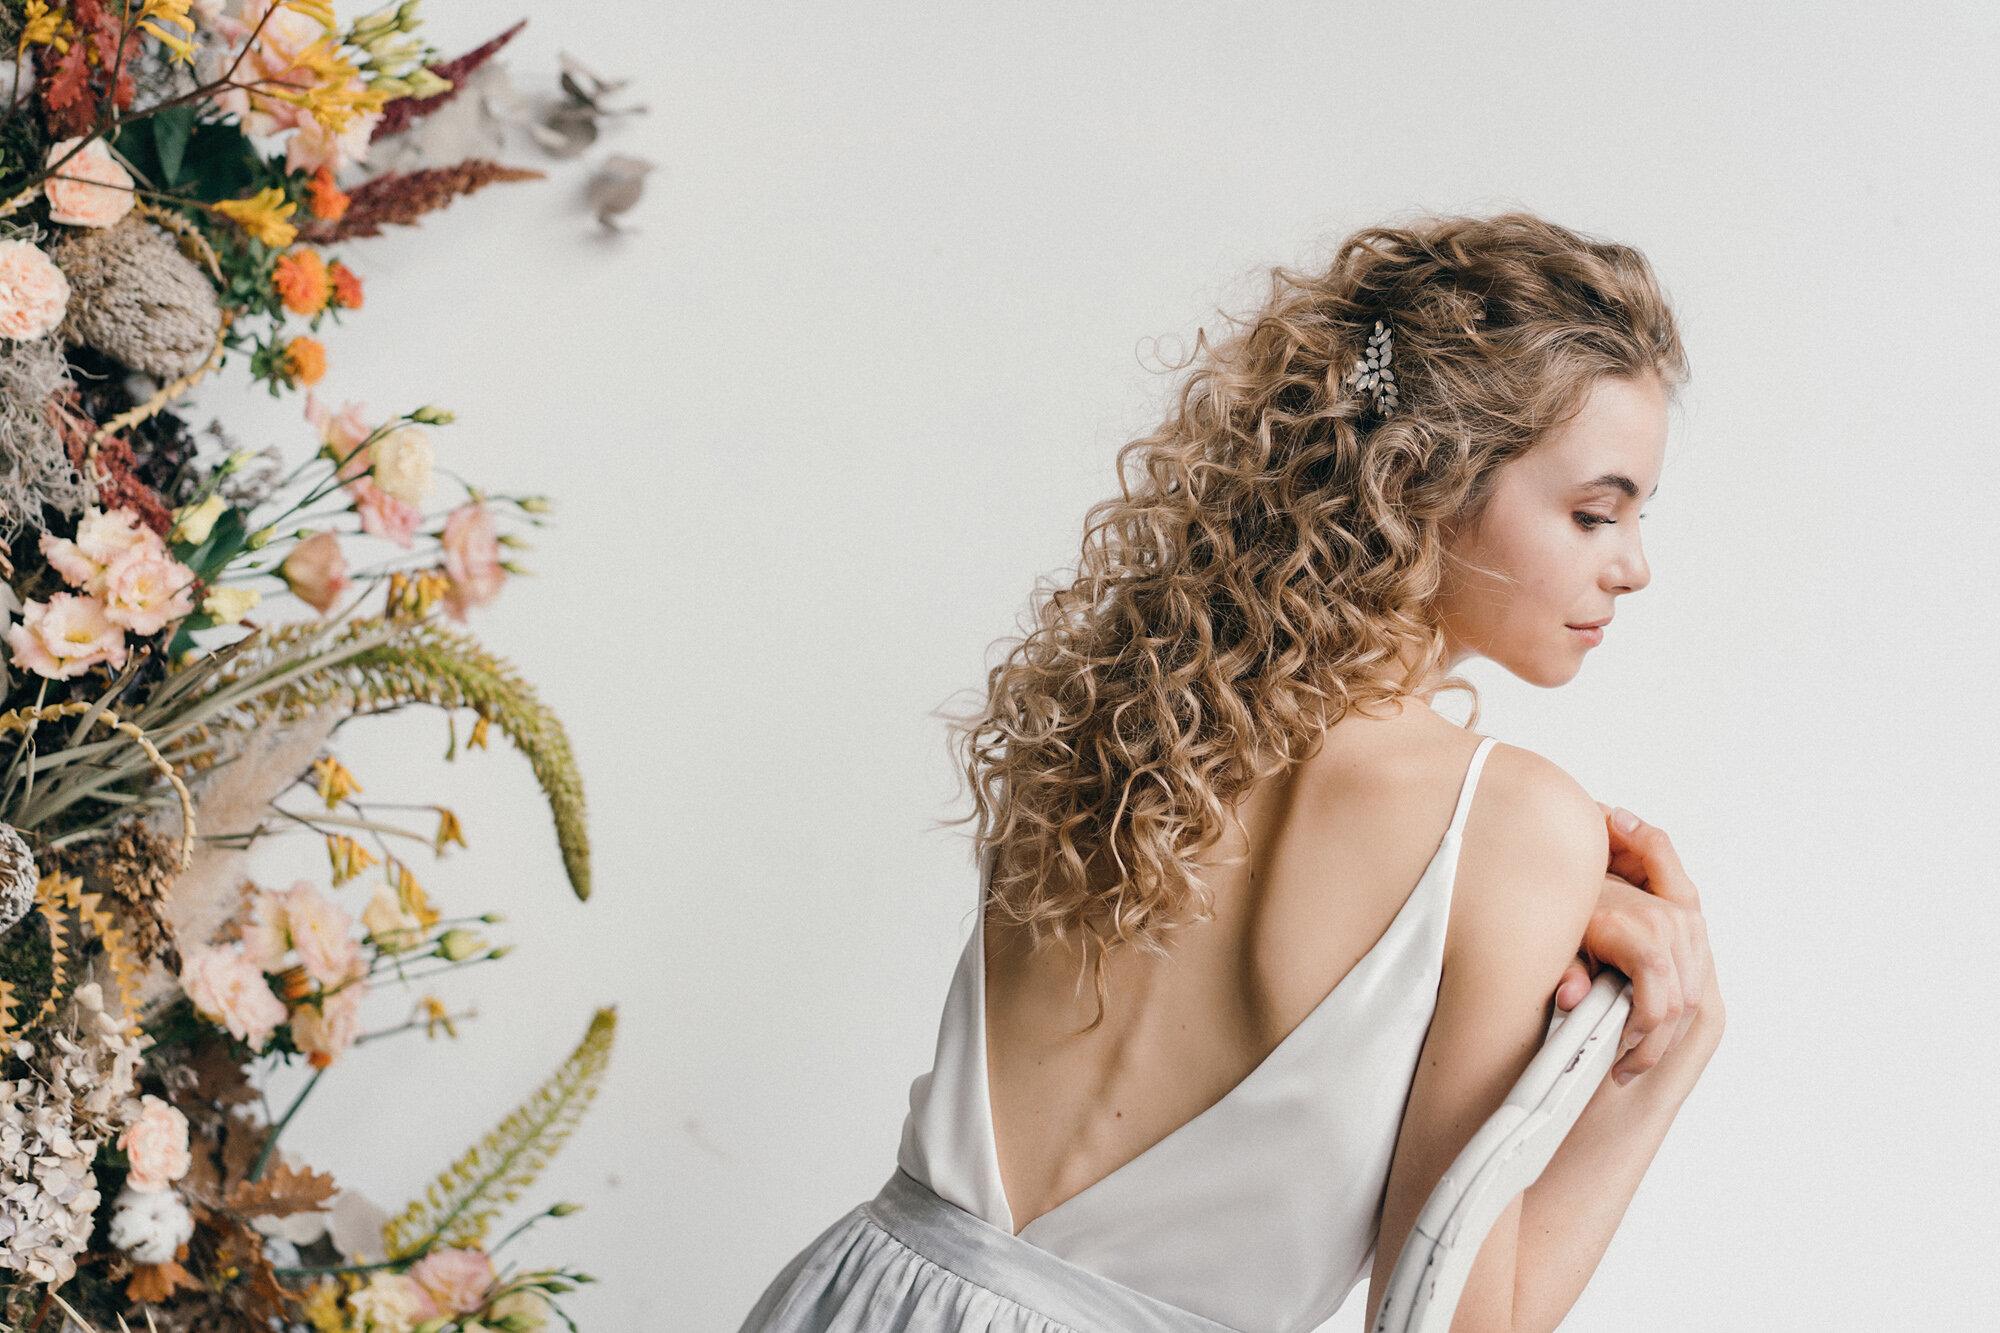 Debbie-Carlisle-Bridal-Accessories-Kate-Beaumont-Wedding-Gowns-Sheffield-Yorkshire-UK-22.jpg